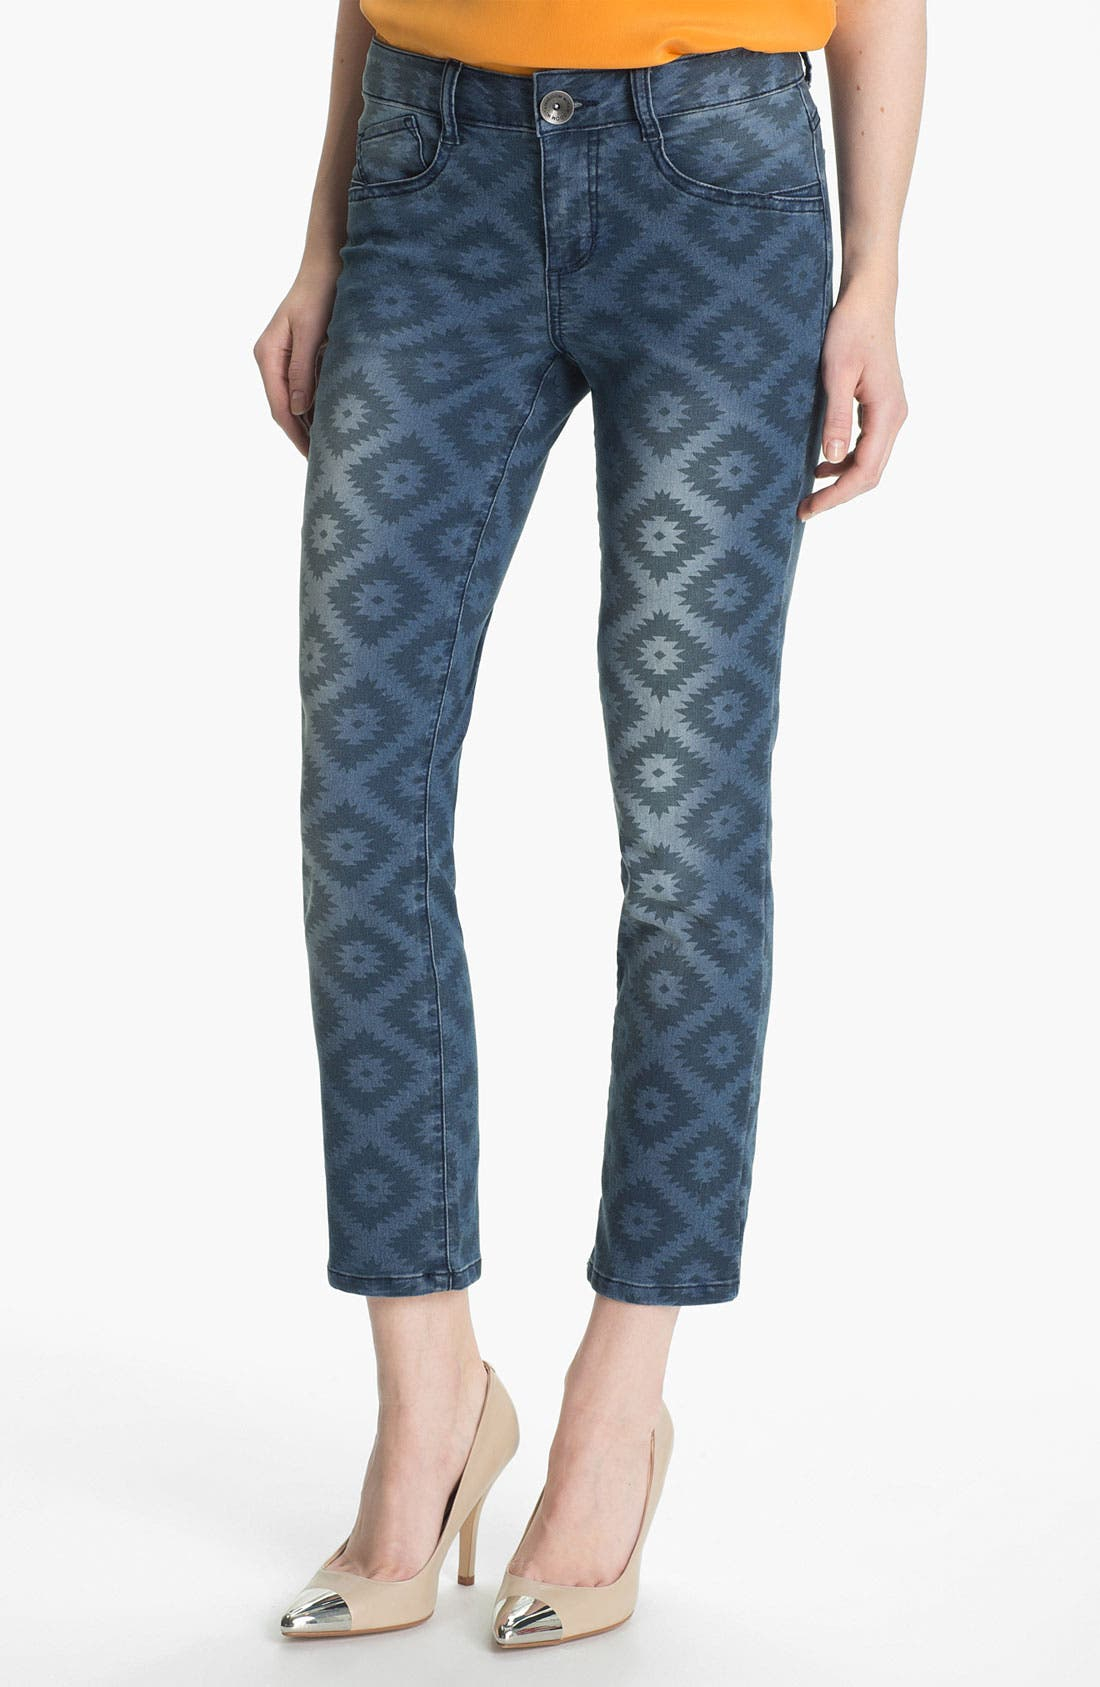 Main Image - Wit & Wisdom Aztec Print Ankle Jeans (Nordstrom Exclusive)